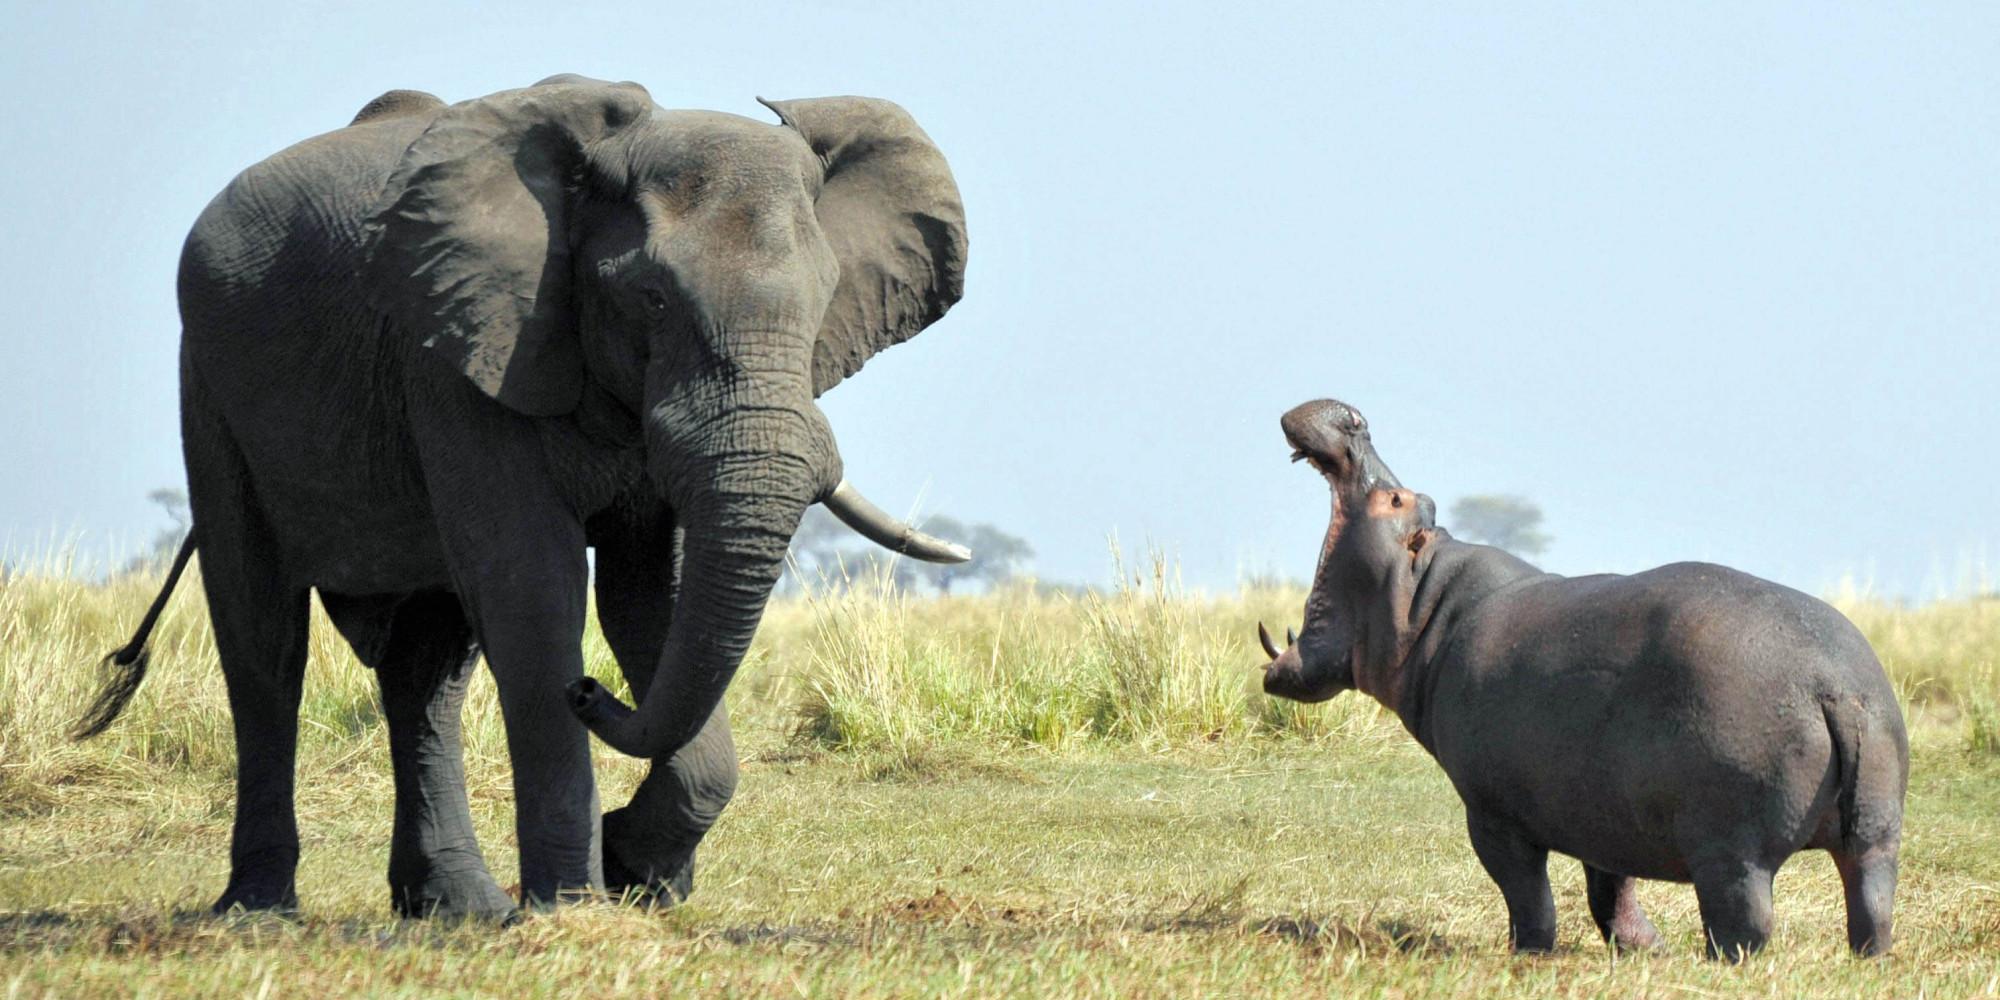 elephant and hippo disagree, face off at botswana's chobe river